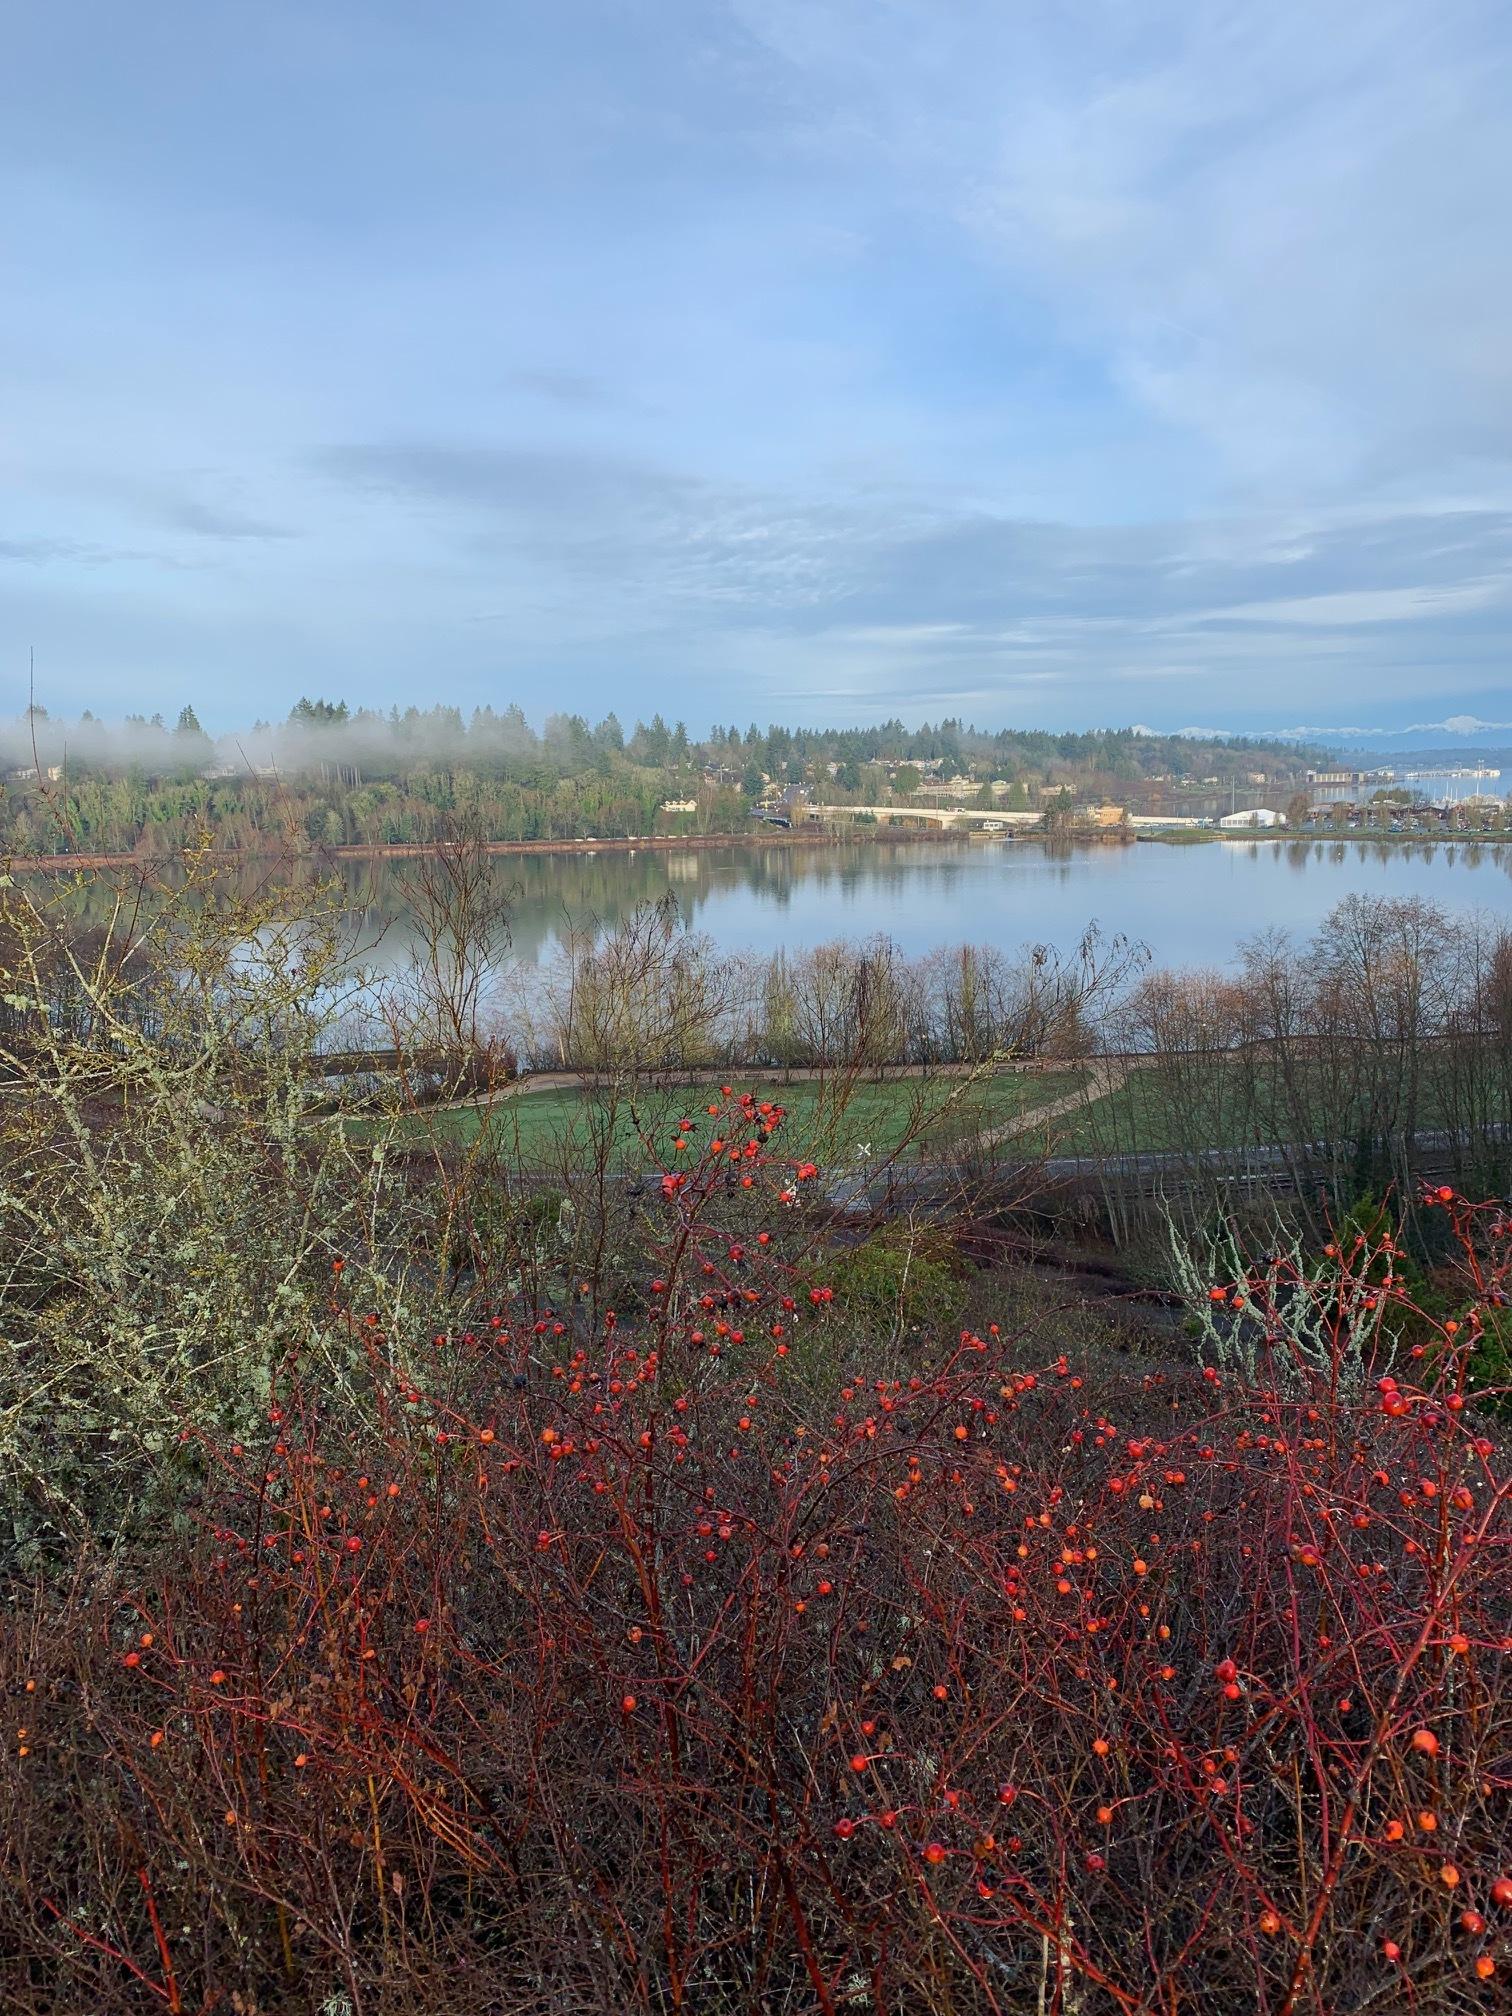 Capitol Lake and West Olympia: Courtesy - Candi Millar